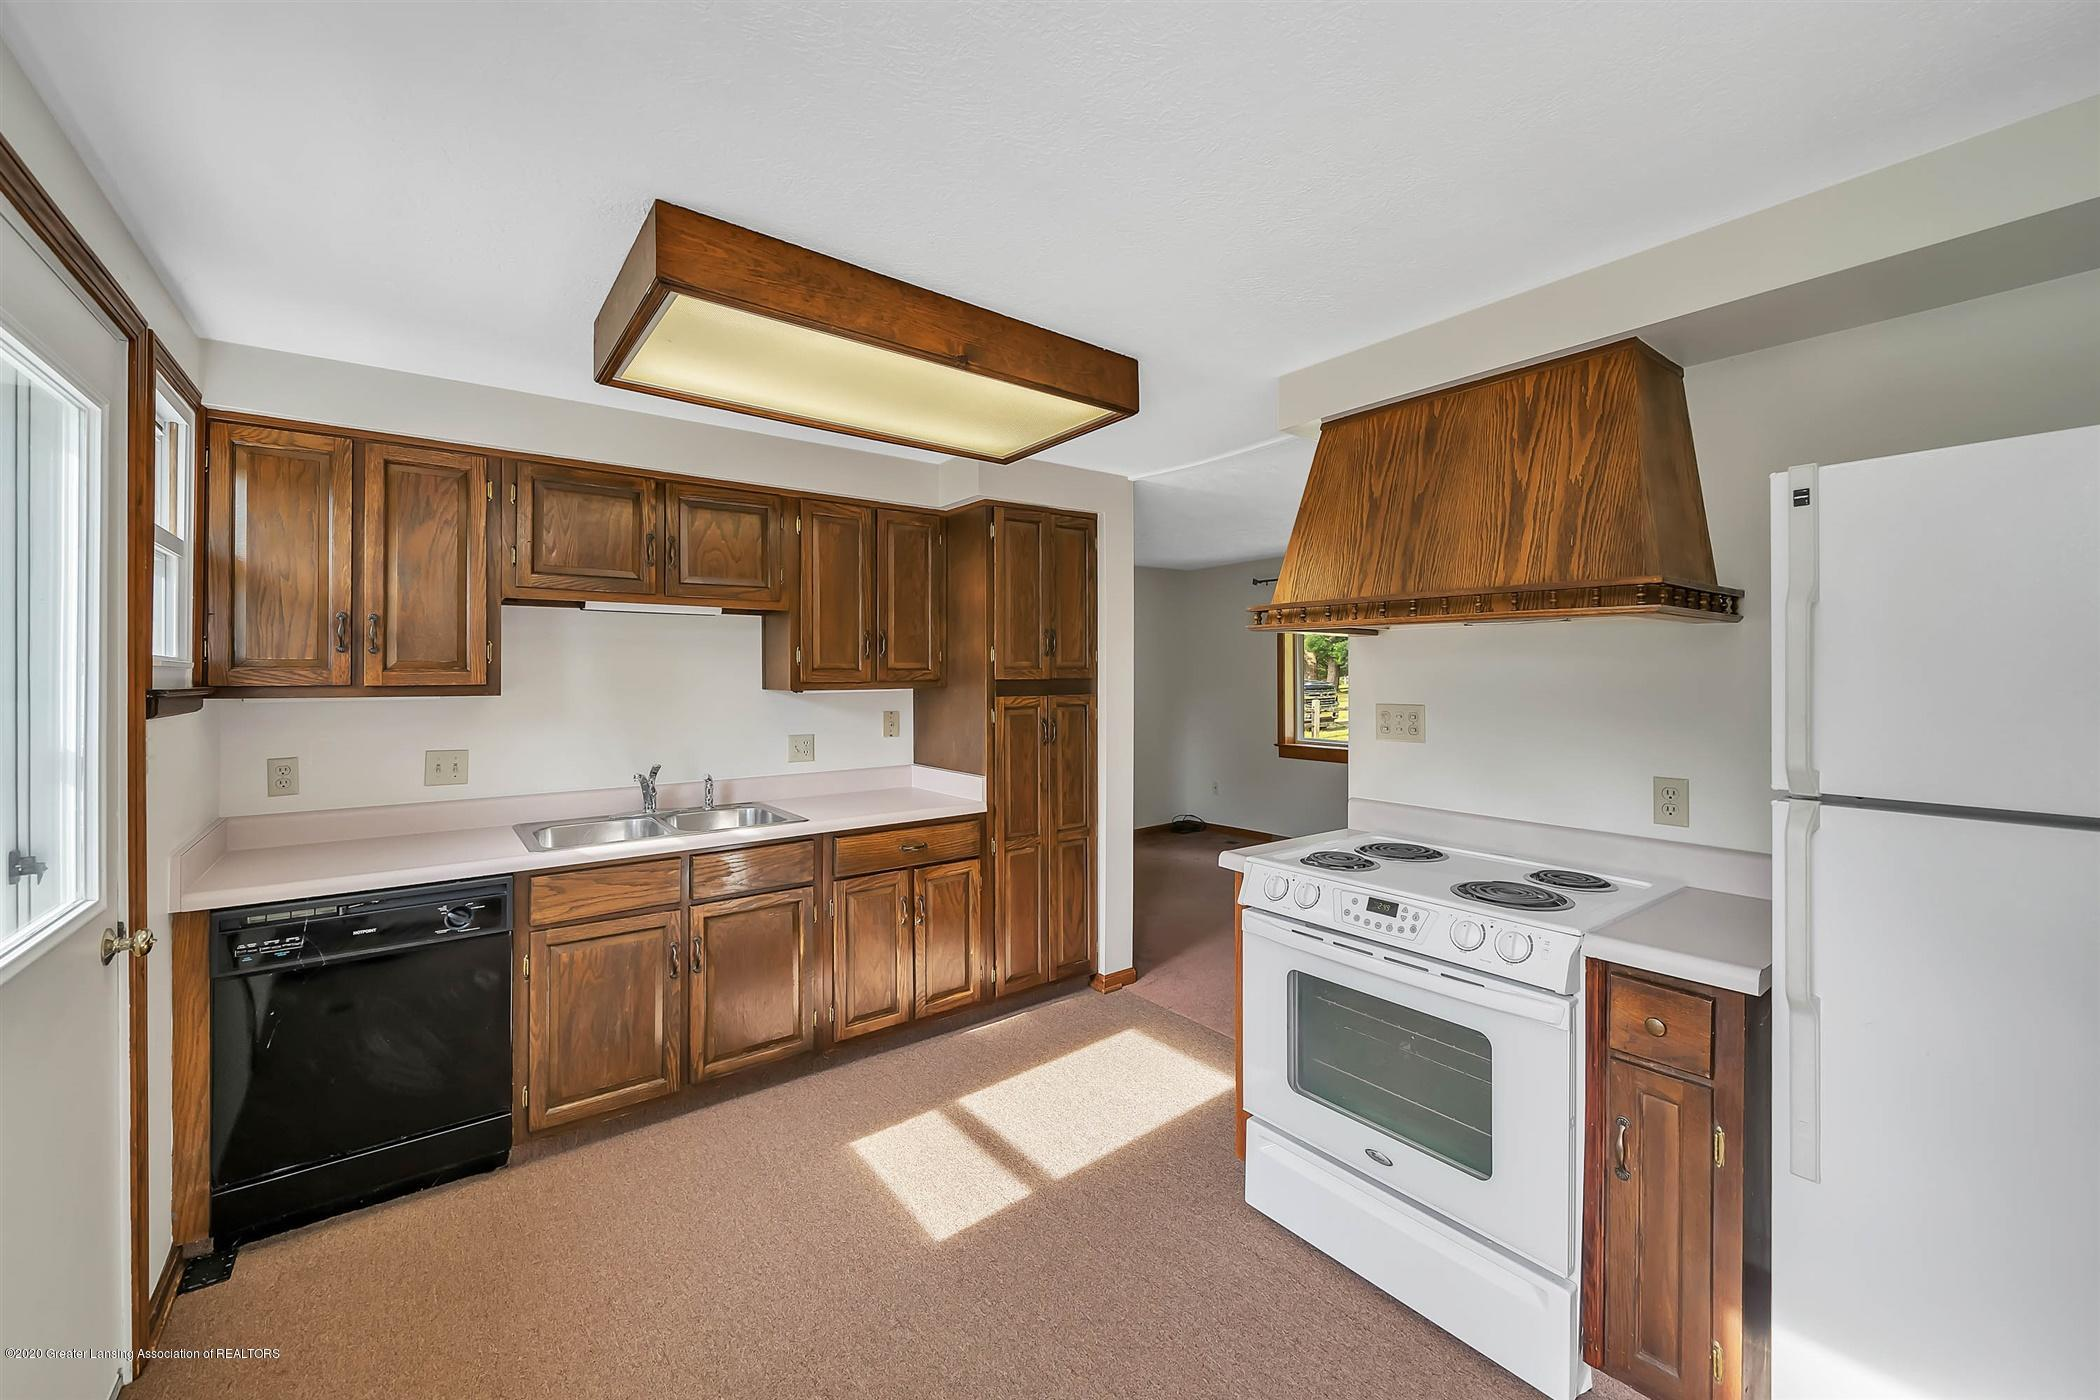 6750 W Lovejoy Rd - (23) 6756 Lovejoy Kitchen - 23